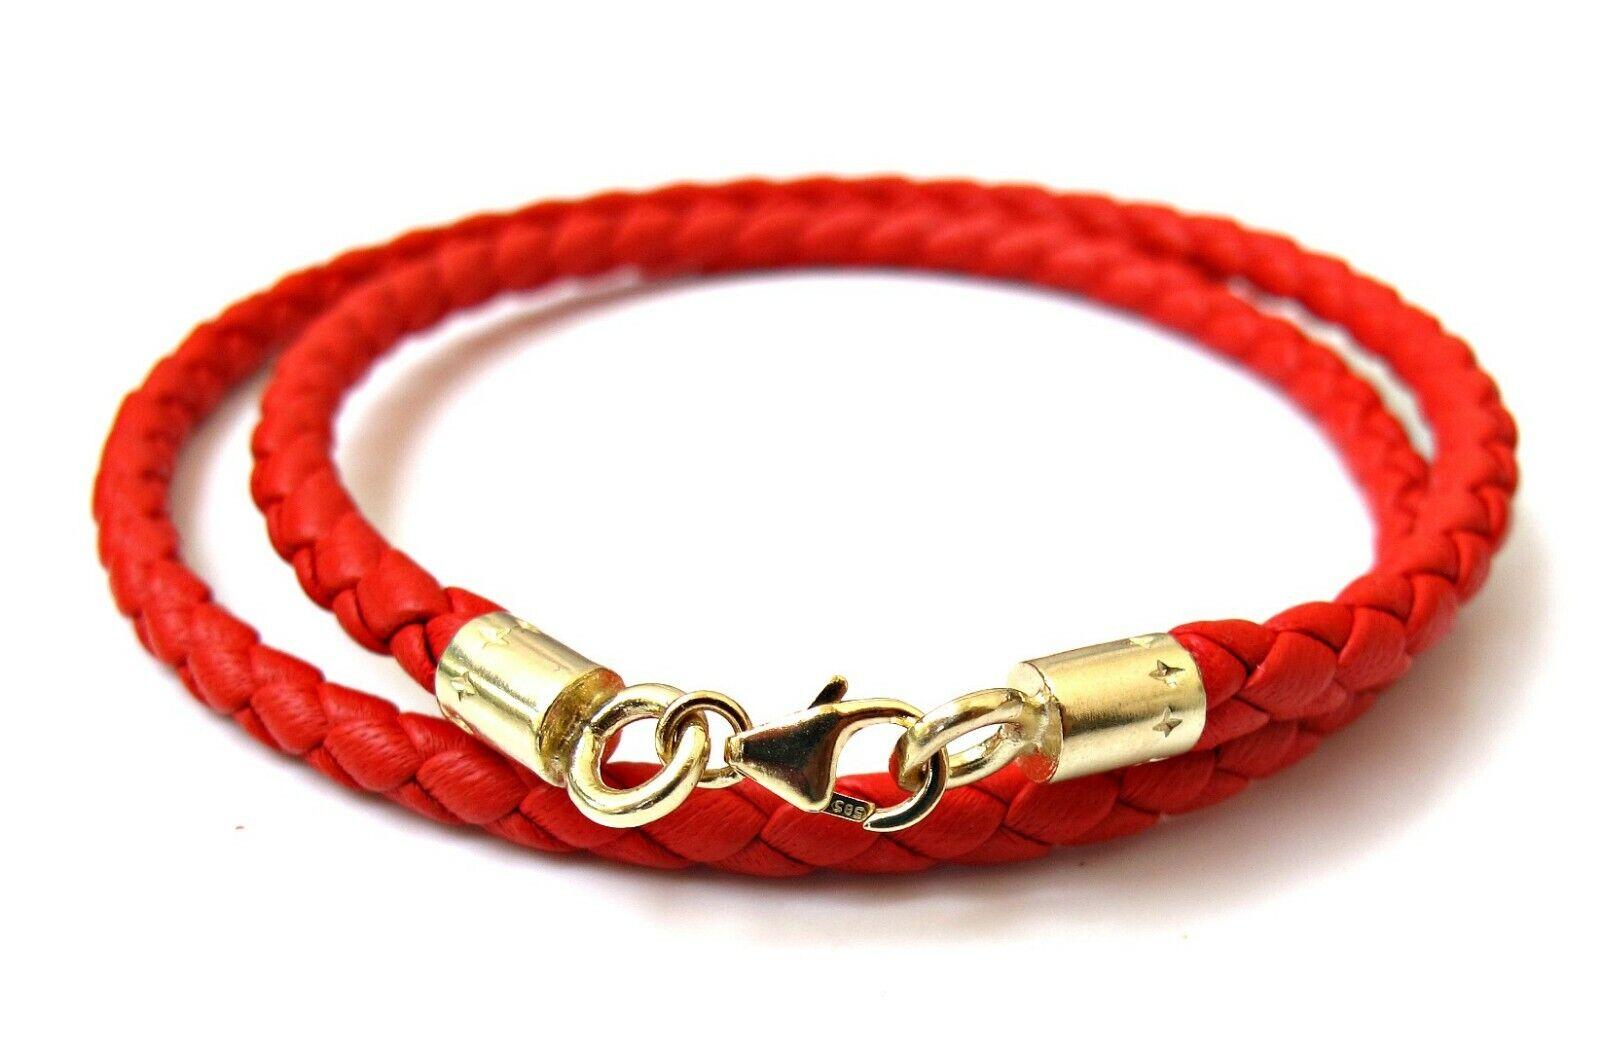 Kabbalah red string solid gold bracelet original authentic luxurious 14k amulet